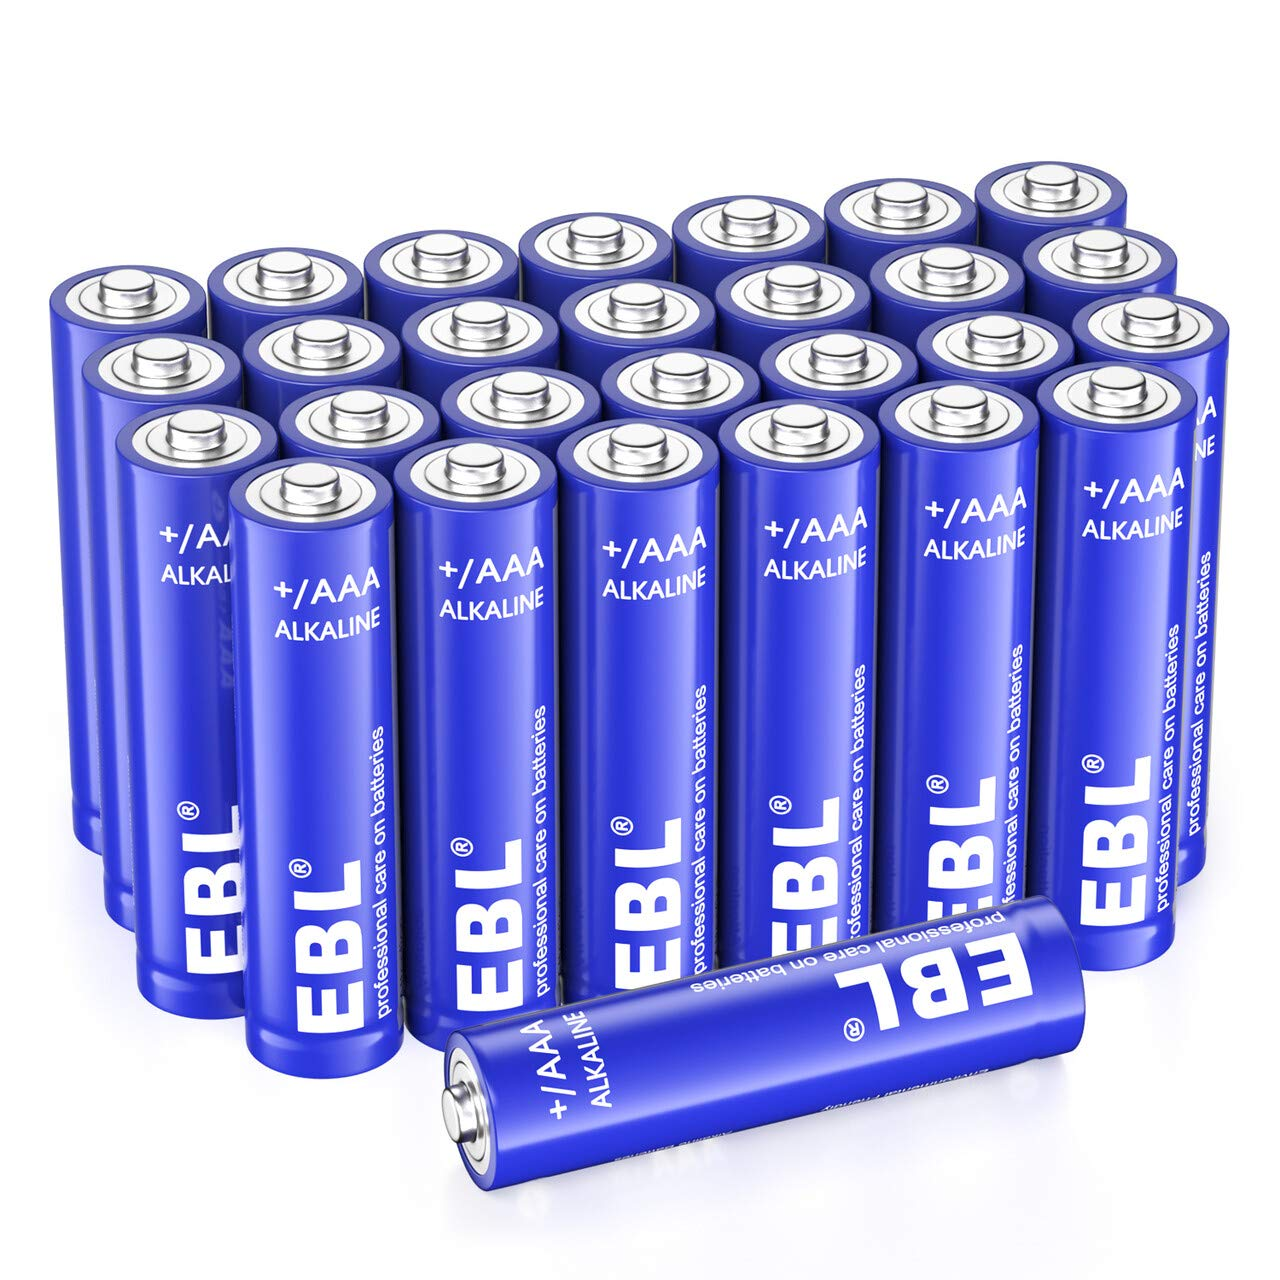 EBL Alkaline AAA Batteries - 1.5V Triple A Long-Lasting Alkaline Battery with 10-Year Shelf Life - Pack of 28